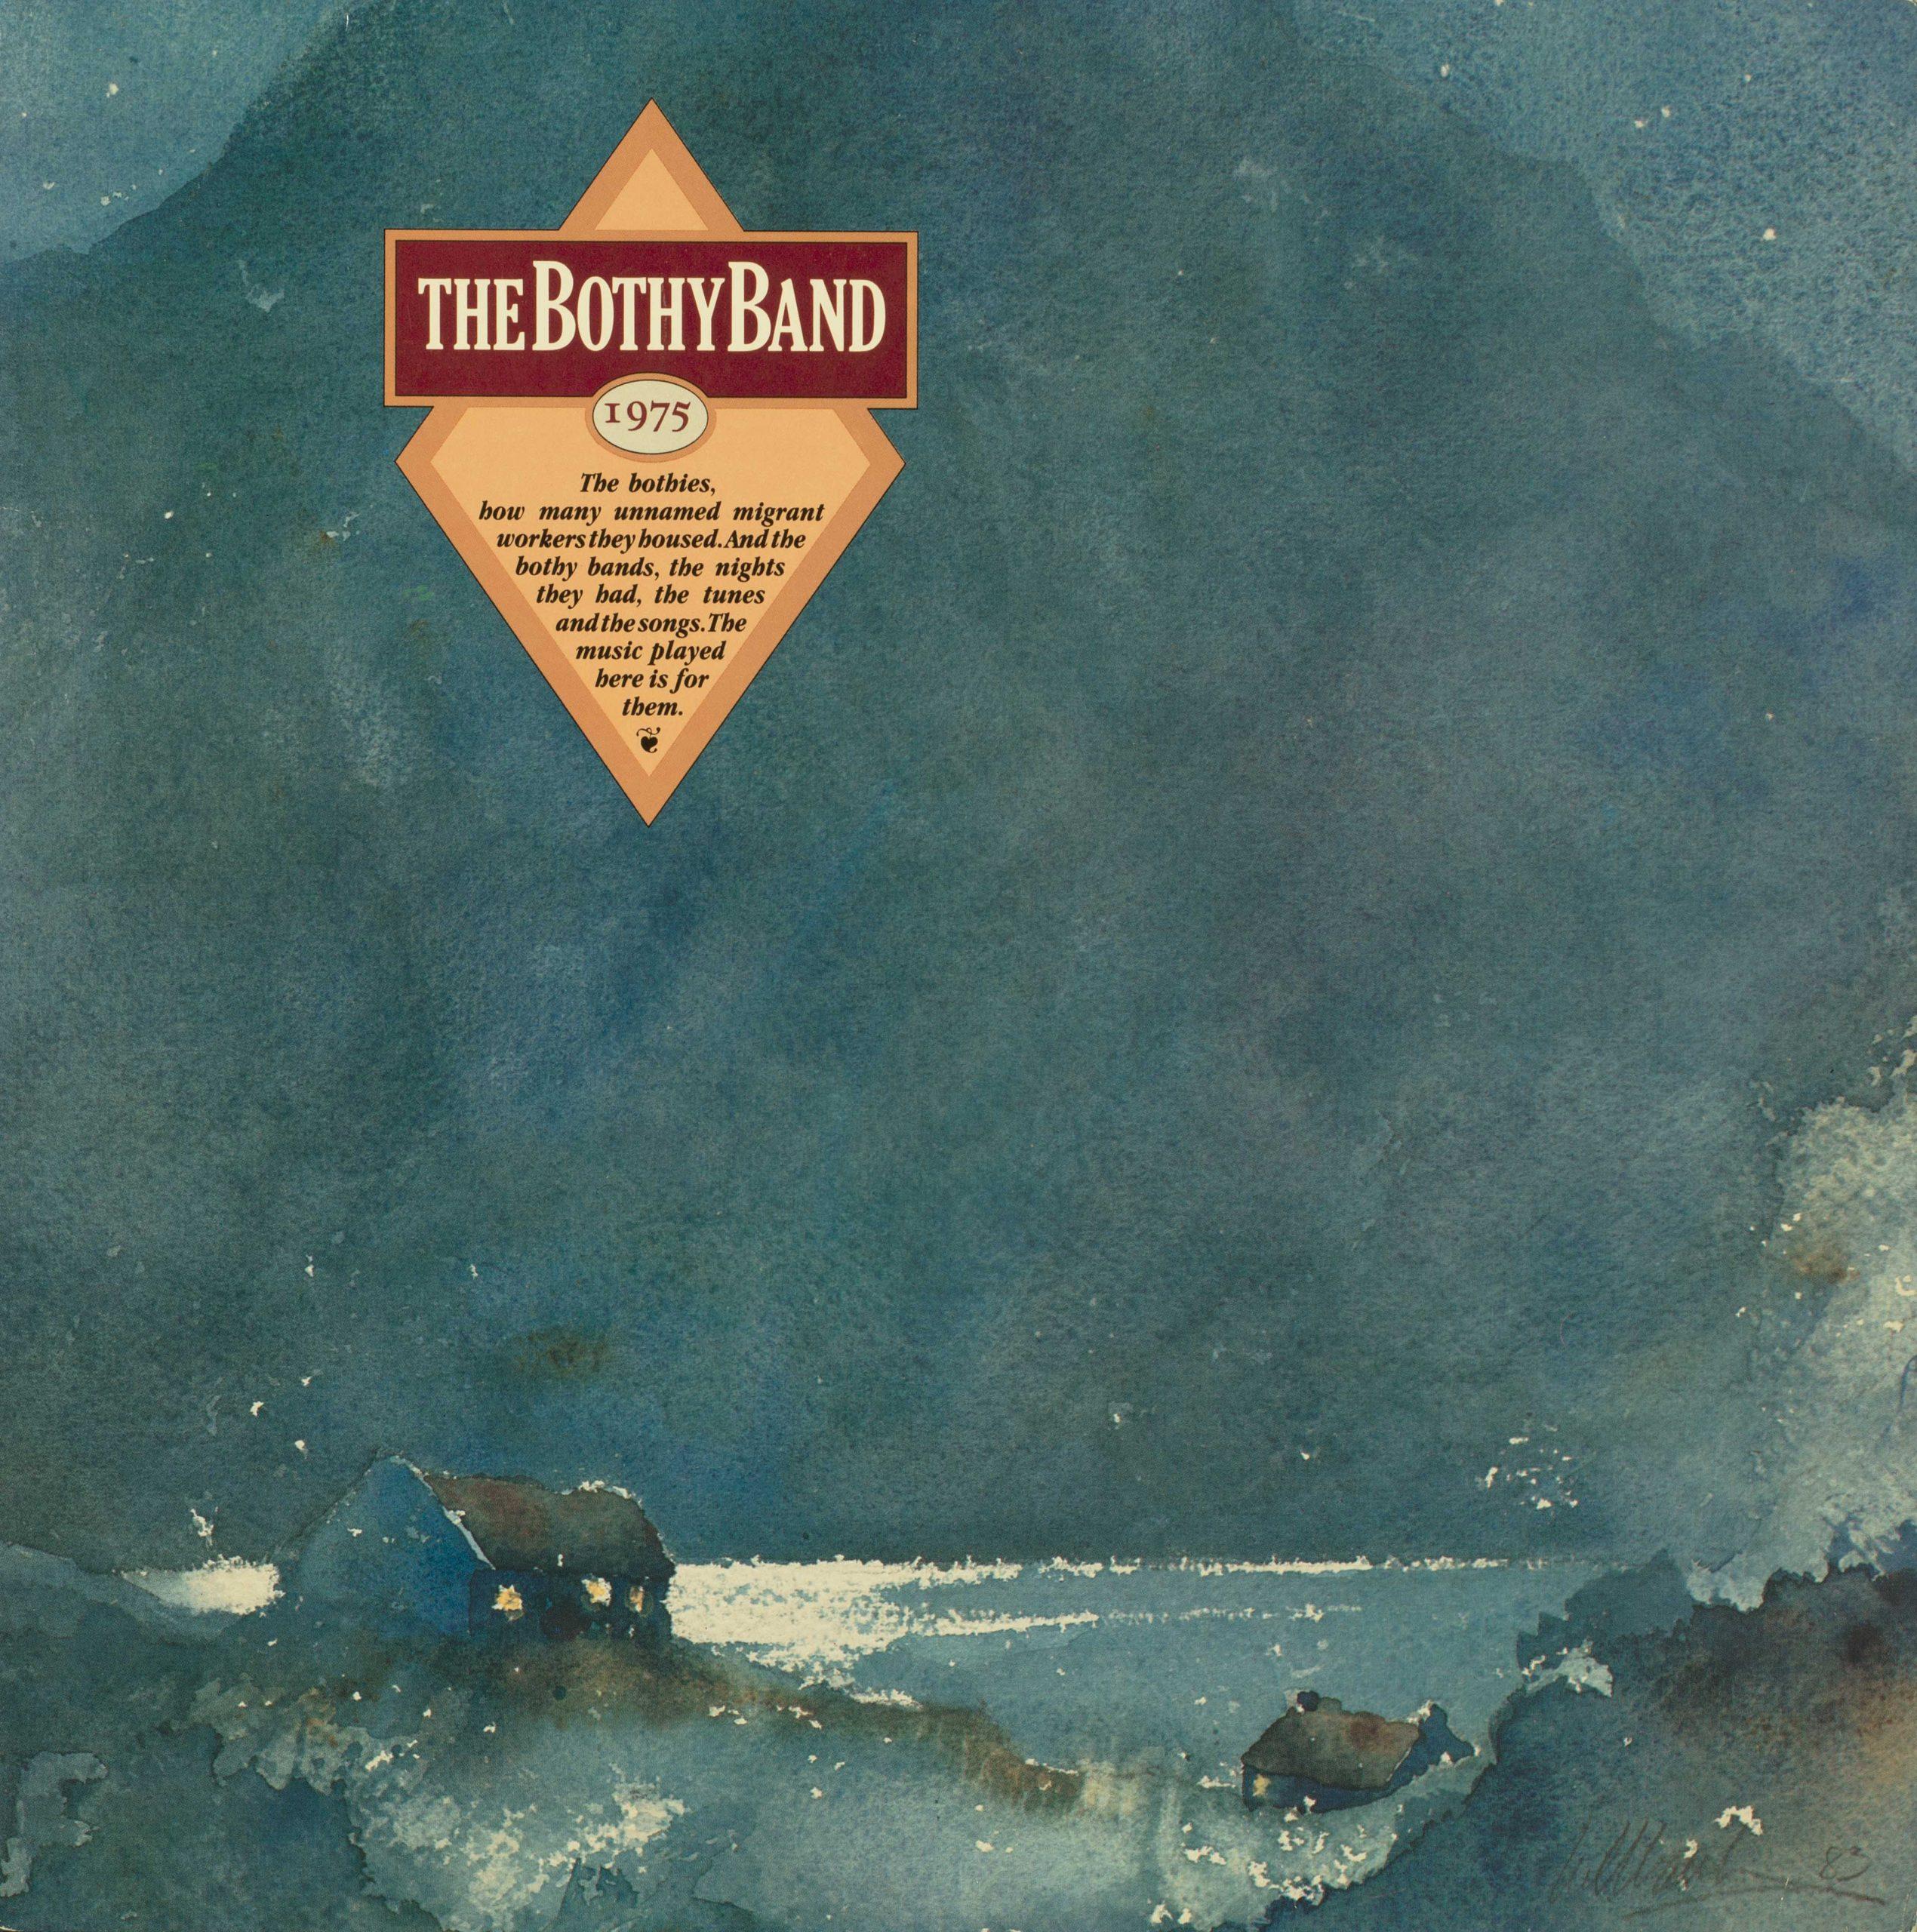 The Bothy Band 1975